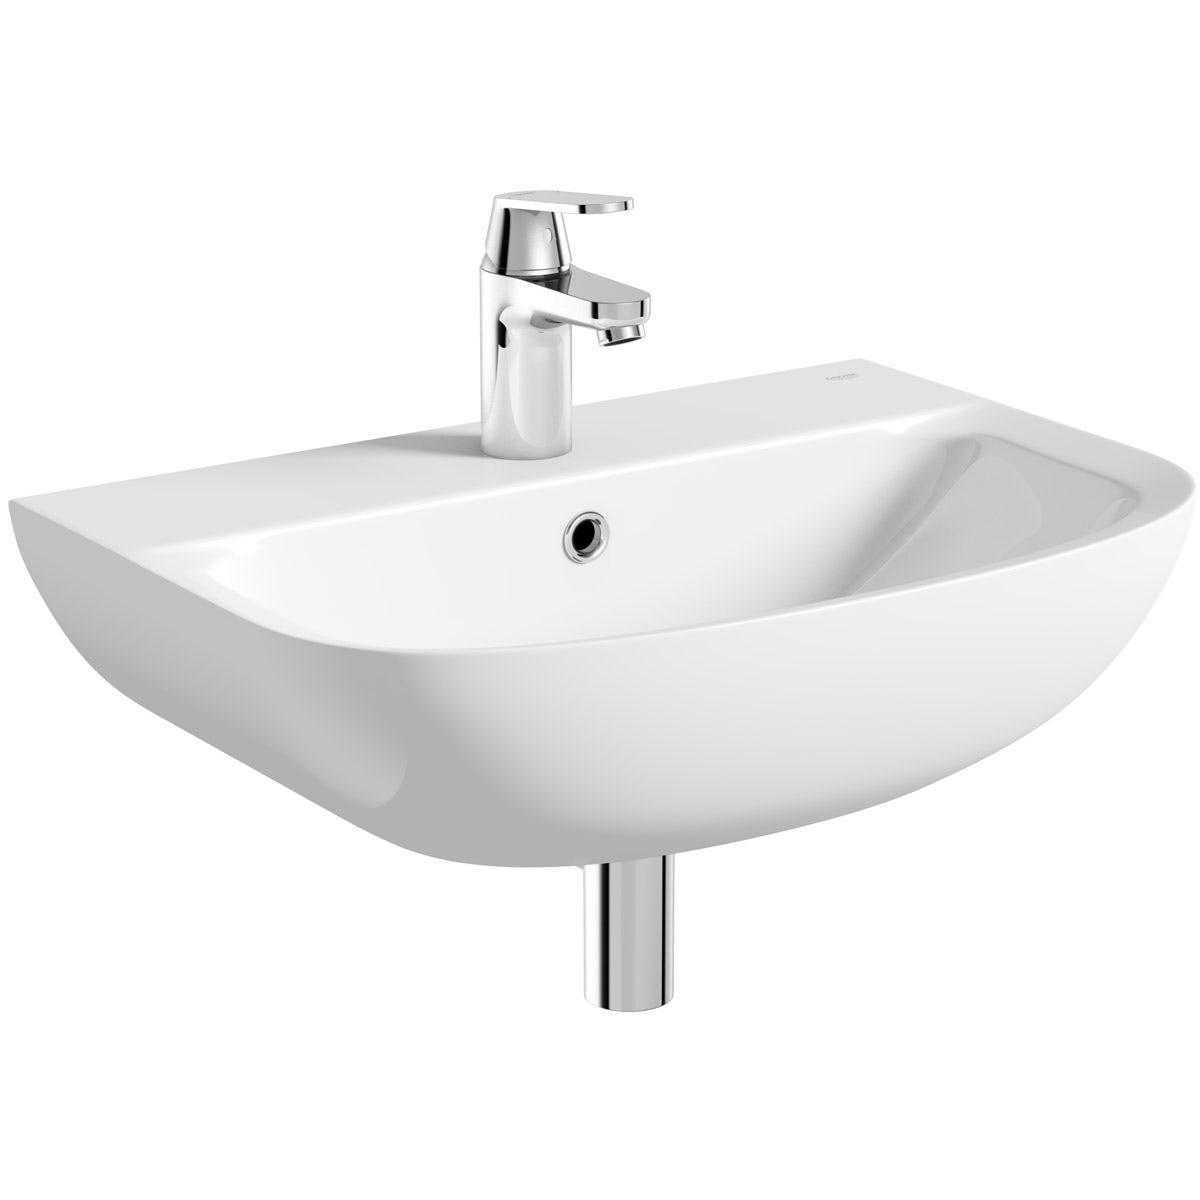 Grohe Bau 1 tap hole wall hung basin 550mm